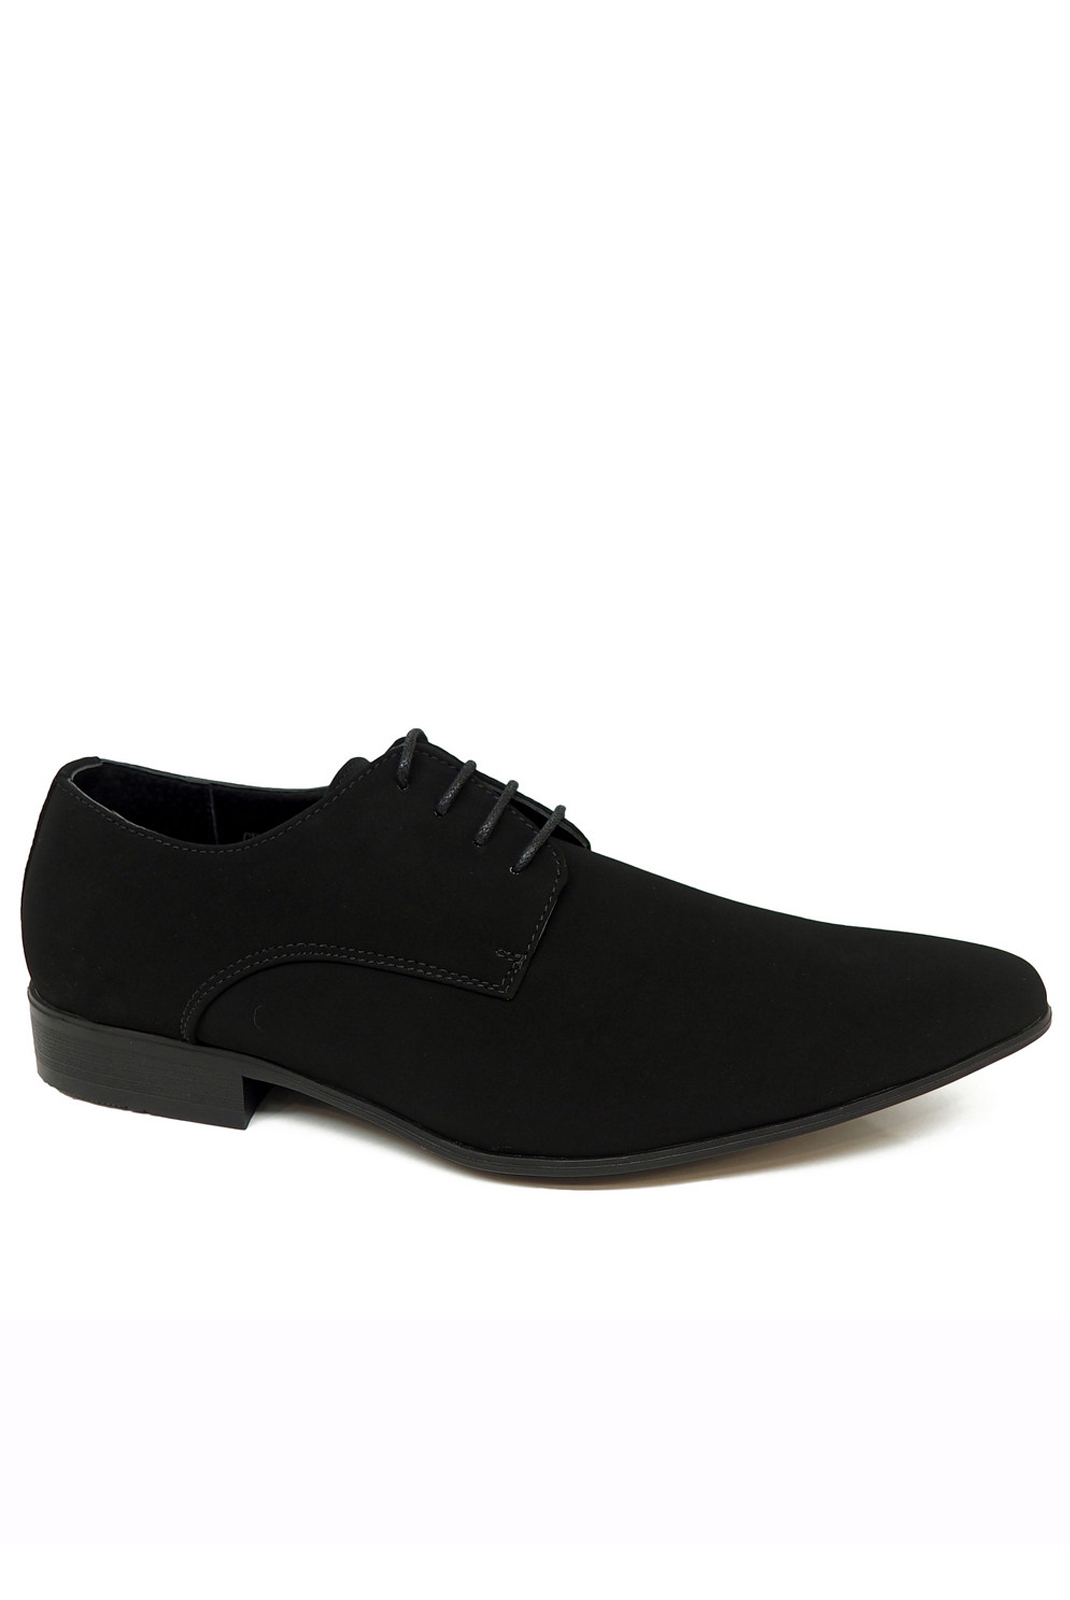 Chaussures de ville  Galax GH2019-M NOIR